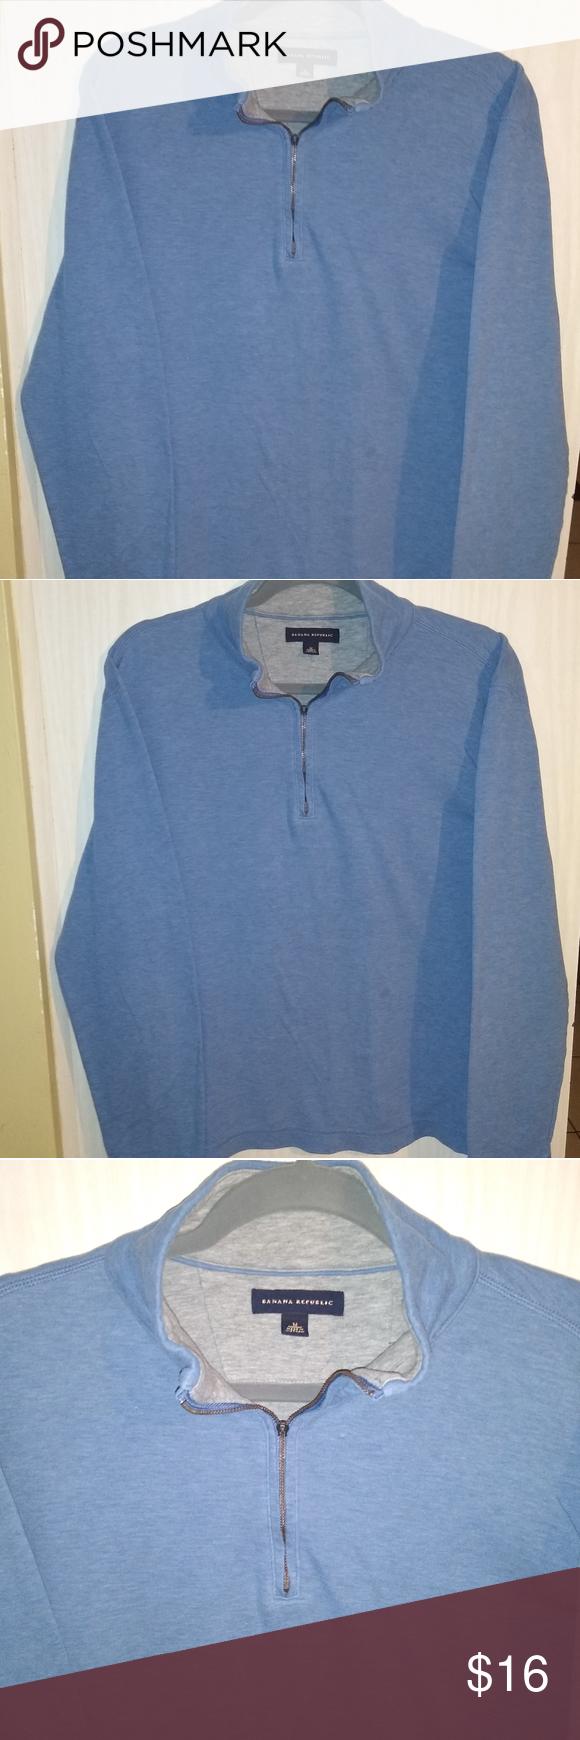 Clearance 4 14 Mens Banana Republic Sweatshirt Mens Banana Republic Sweatshirt With High Collar Upper Long Sleeve Tshirt Men Sweatshirt Shirt Mens Sweatshirts [ 1740 x 580 Pixel ]